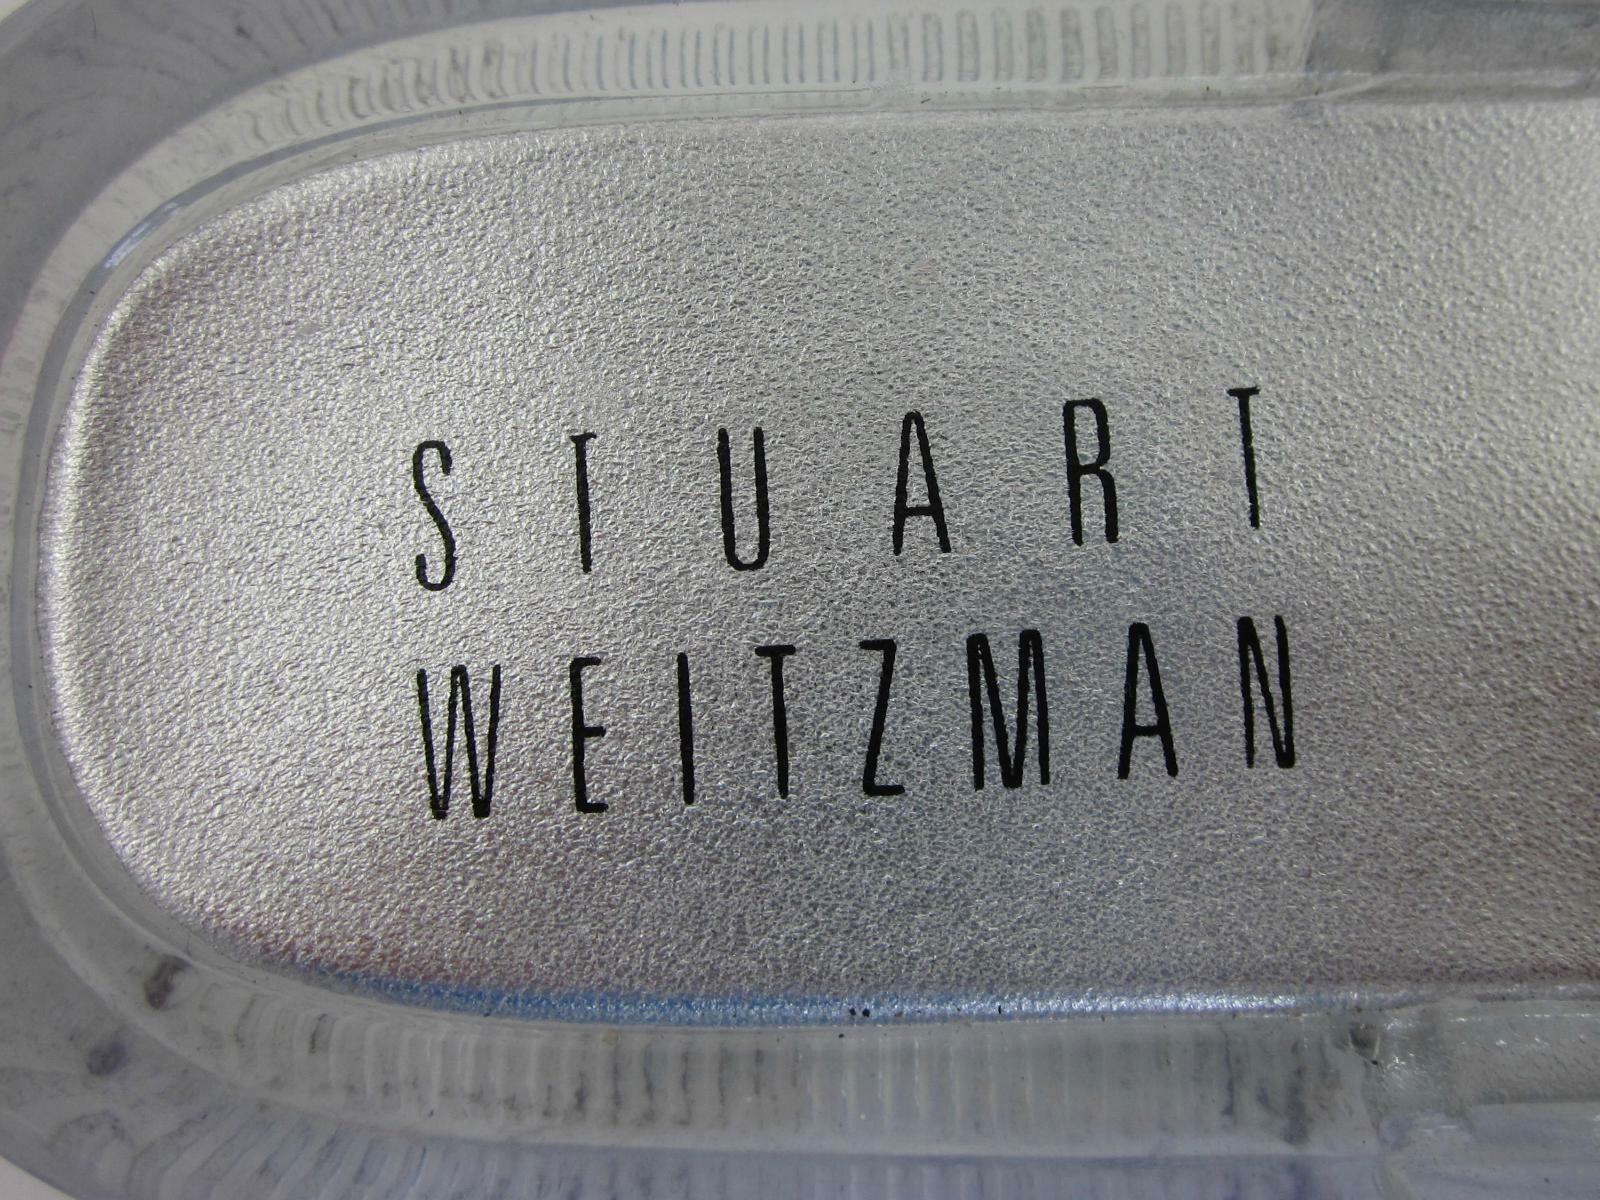 Stuart Weitzman Big Jeweled Thong Jelly Sandales US 5 Runs Big Weitzman Fits US 6-6.5 2cf18f